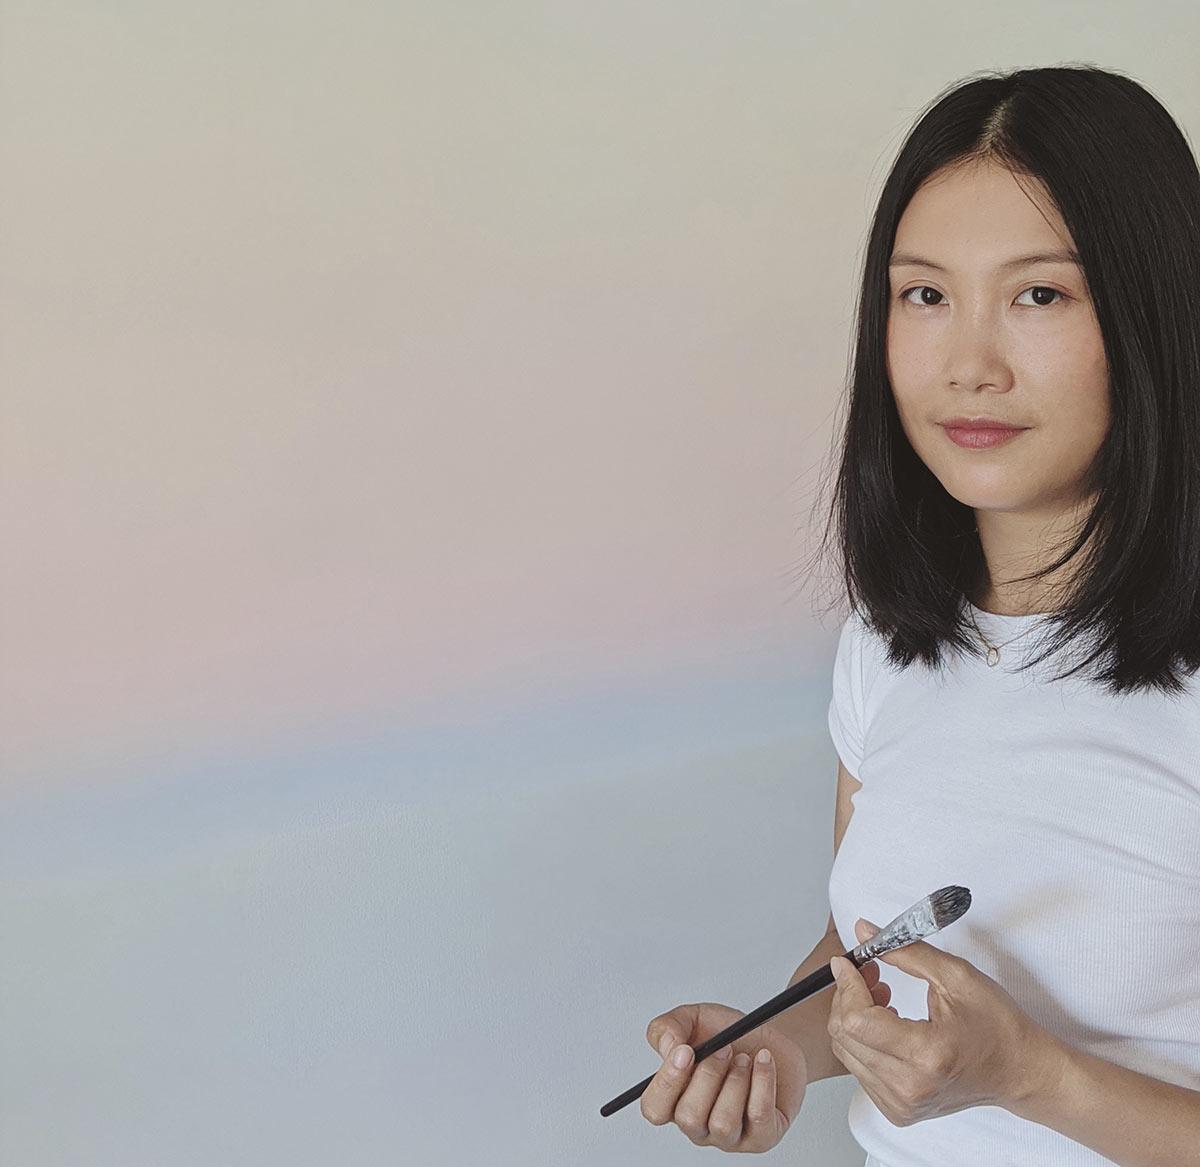 Shu-Linguo-artist-painter